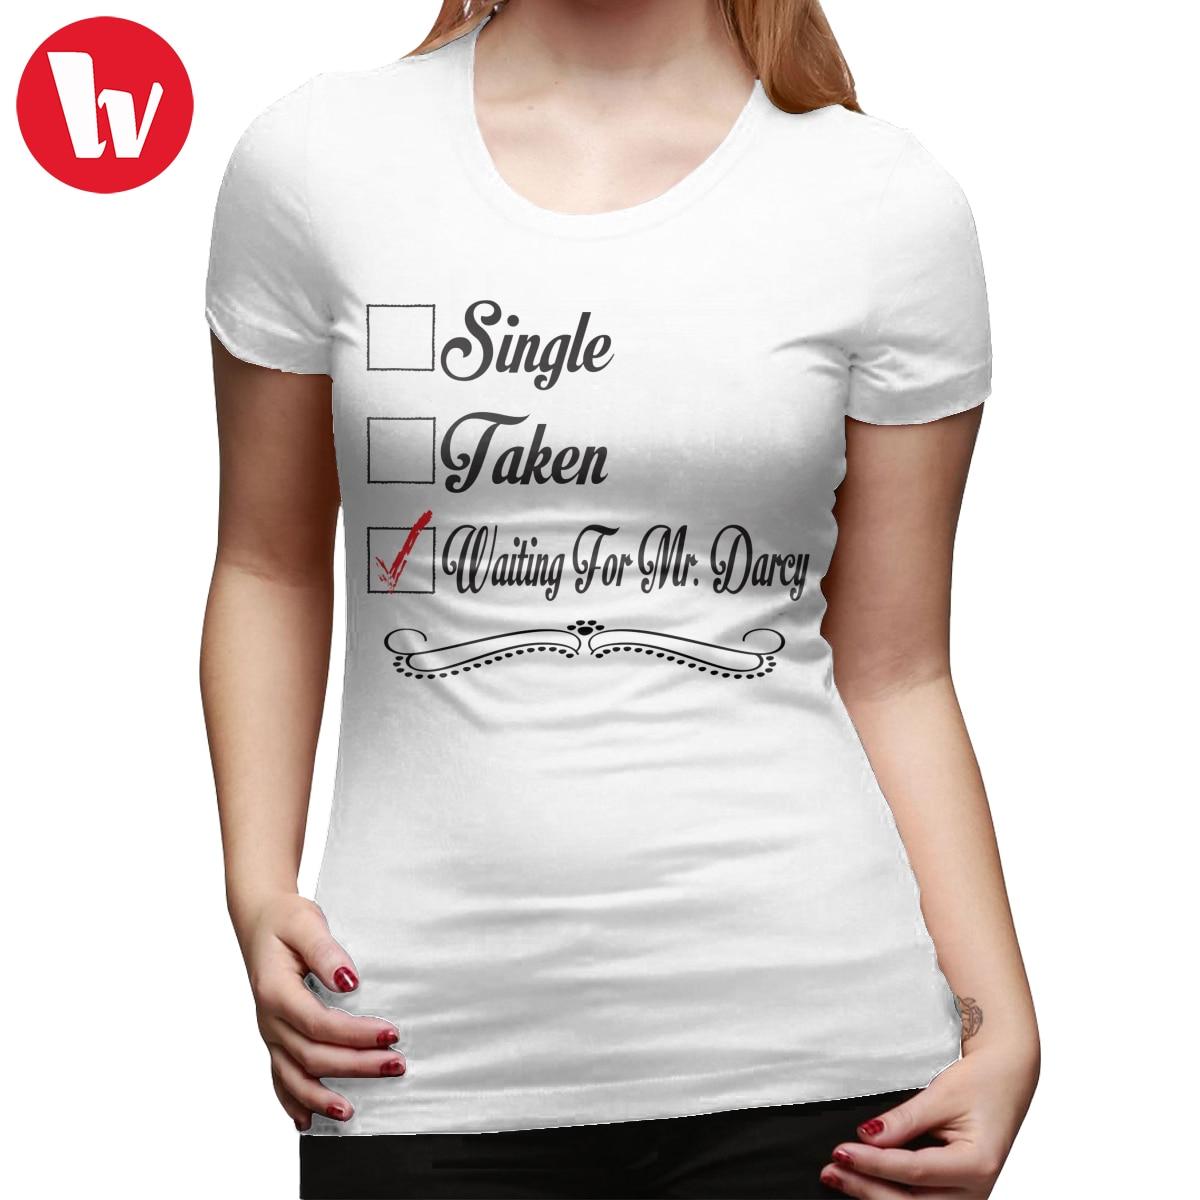 Colin Firth футболка с гордостью и предвзятостью Джейн Остин взят в ожидании MR. DARCY футболка Серебряная простая женская футболка